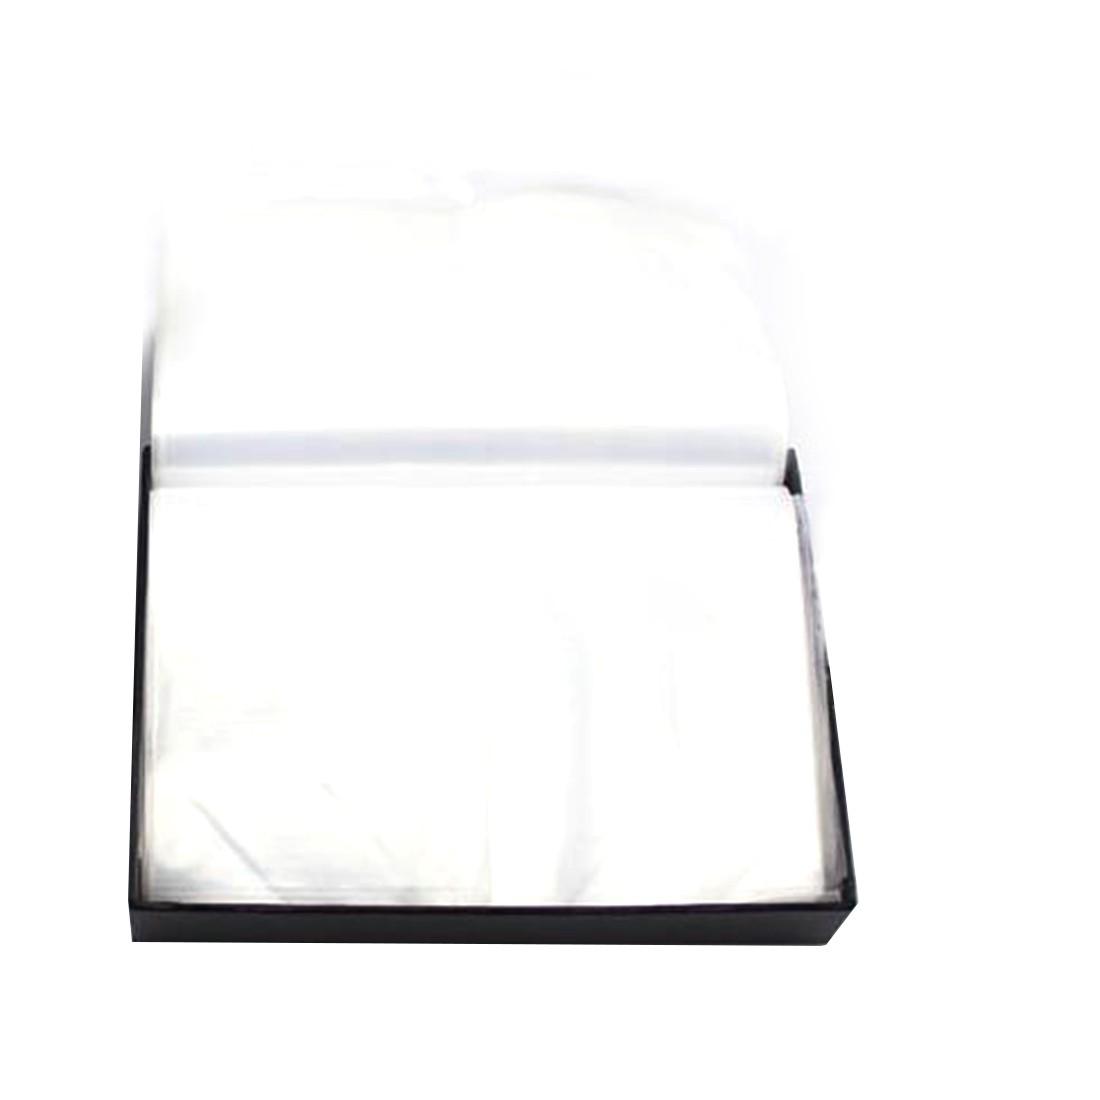 Hot Sterilization Pouches Bag 100 Pcs Medical-grade Tattoo Bottle Washing Bag